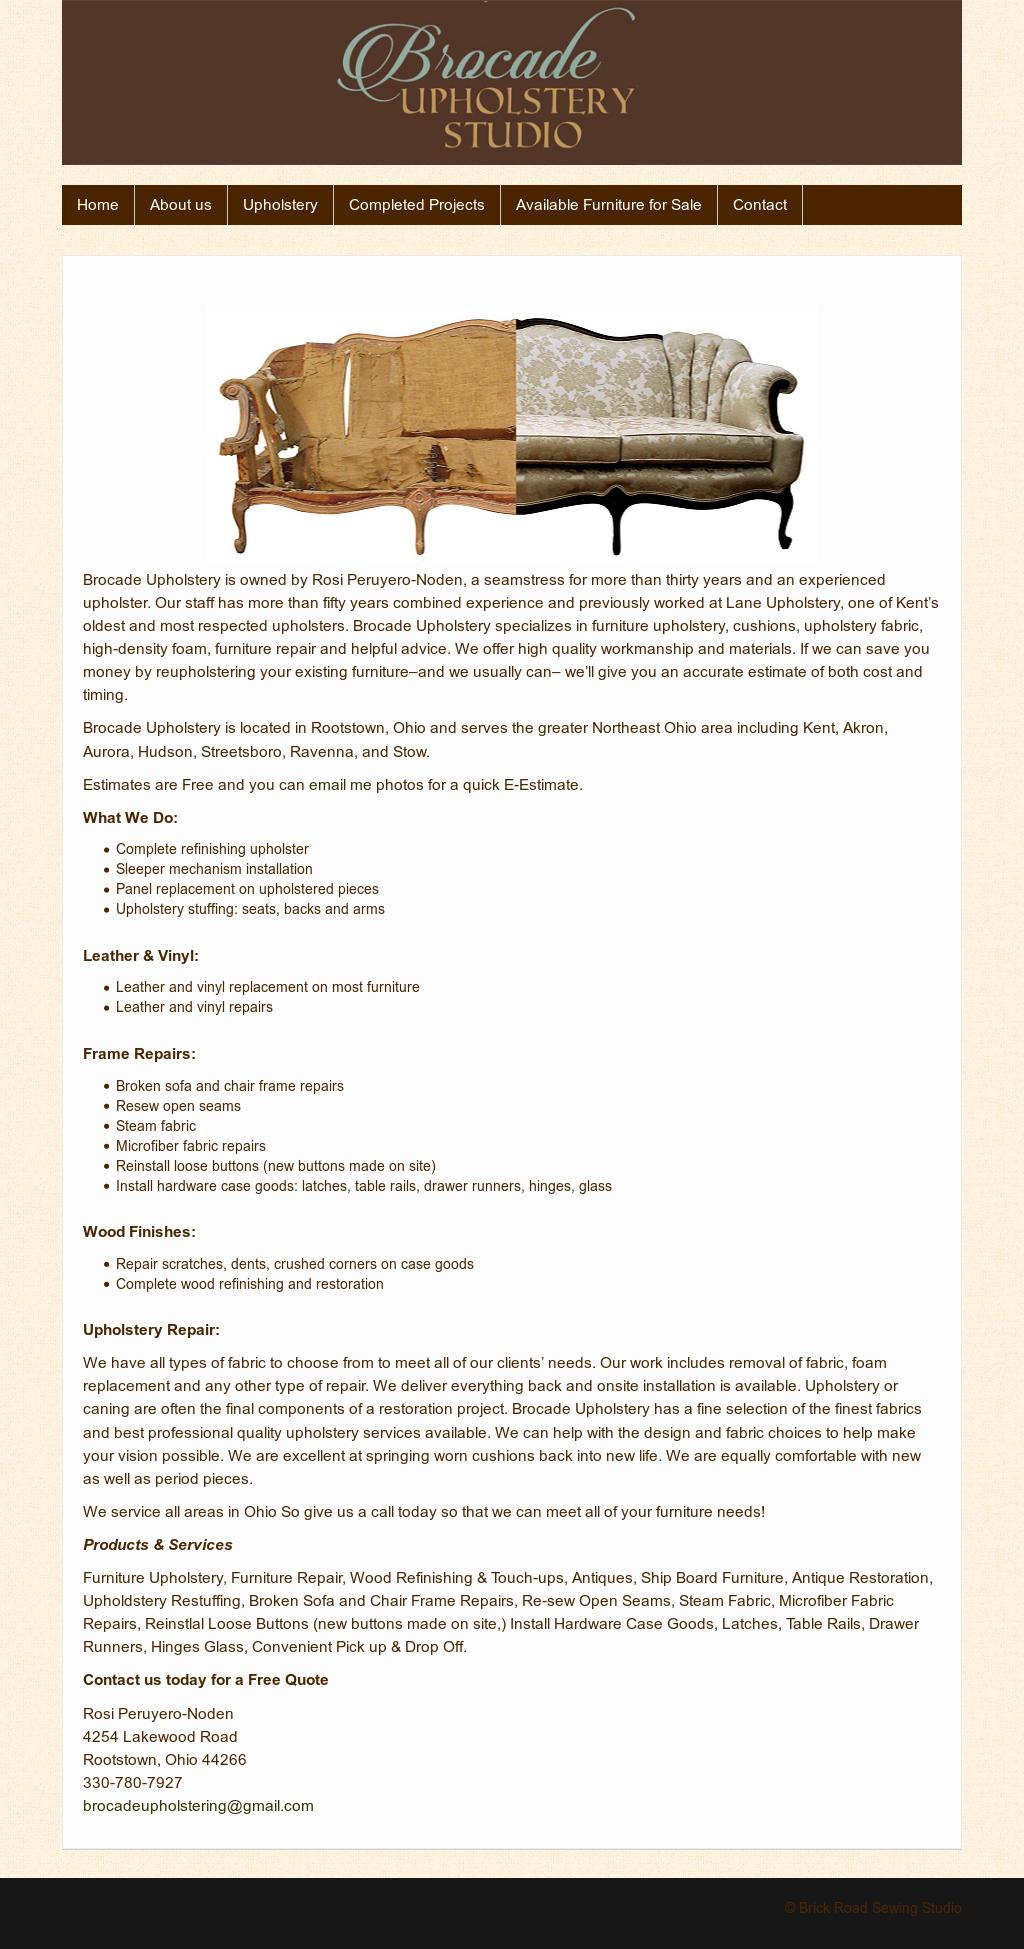 Incredible Brocade Sewing Studio Competitors Revenue And Employees Frankydiablos Diy Chair Ideas Frankydiabloscom